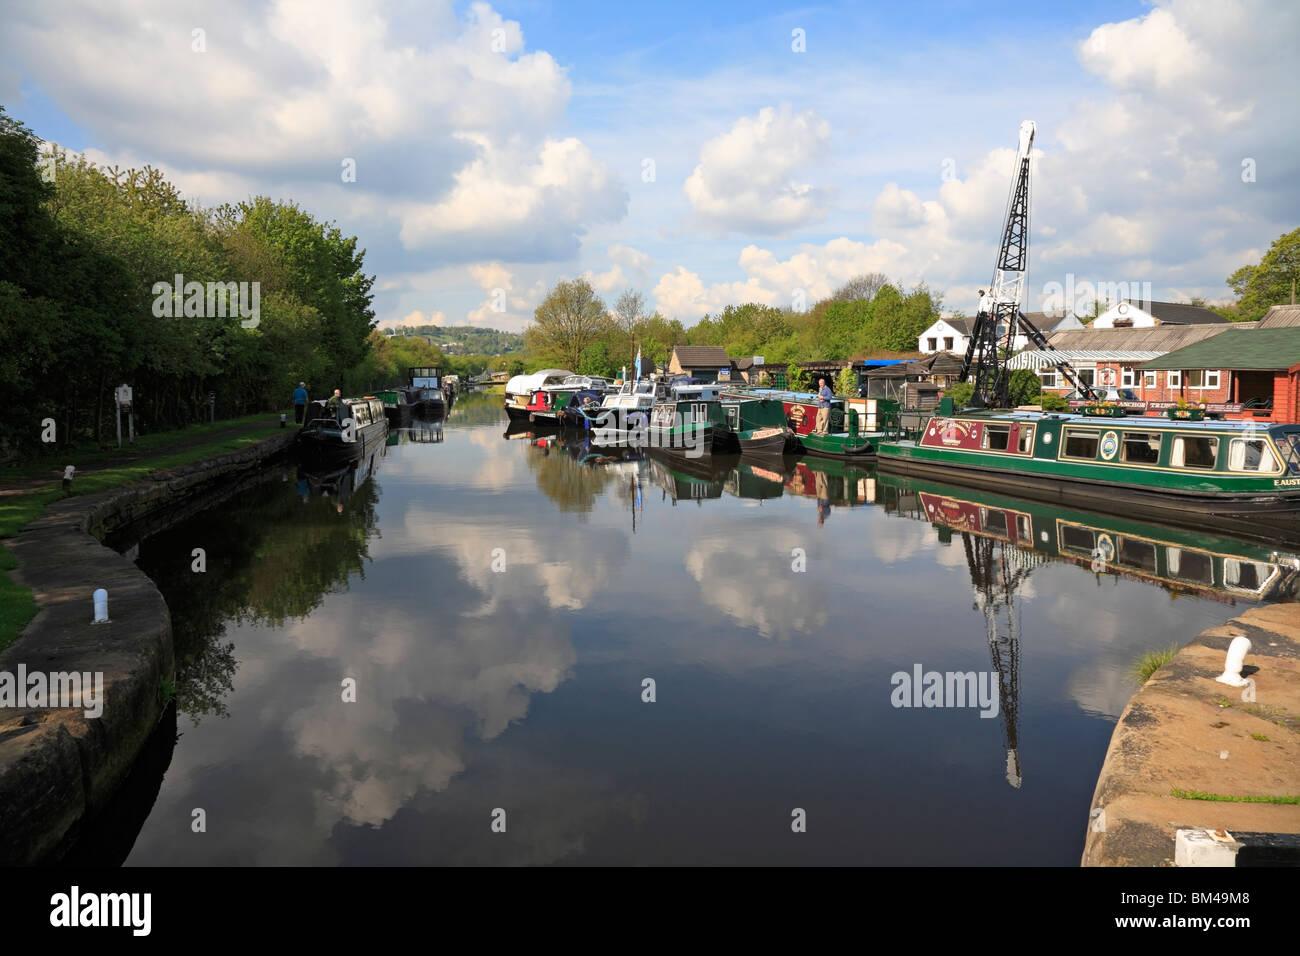 Calder & Hebble Navigation at Shepley Bridge Marina, Mirfield near Huddersfield, West Yorkshire, England, UK. - Stock Image